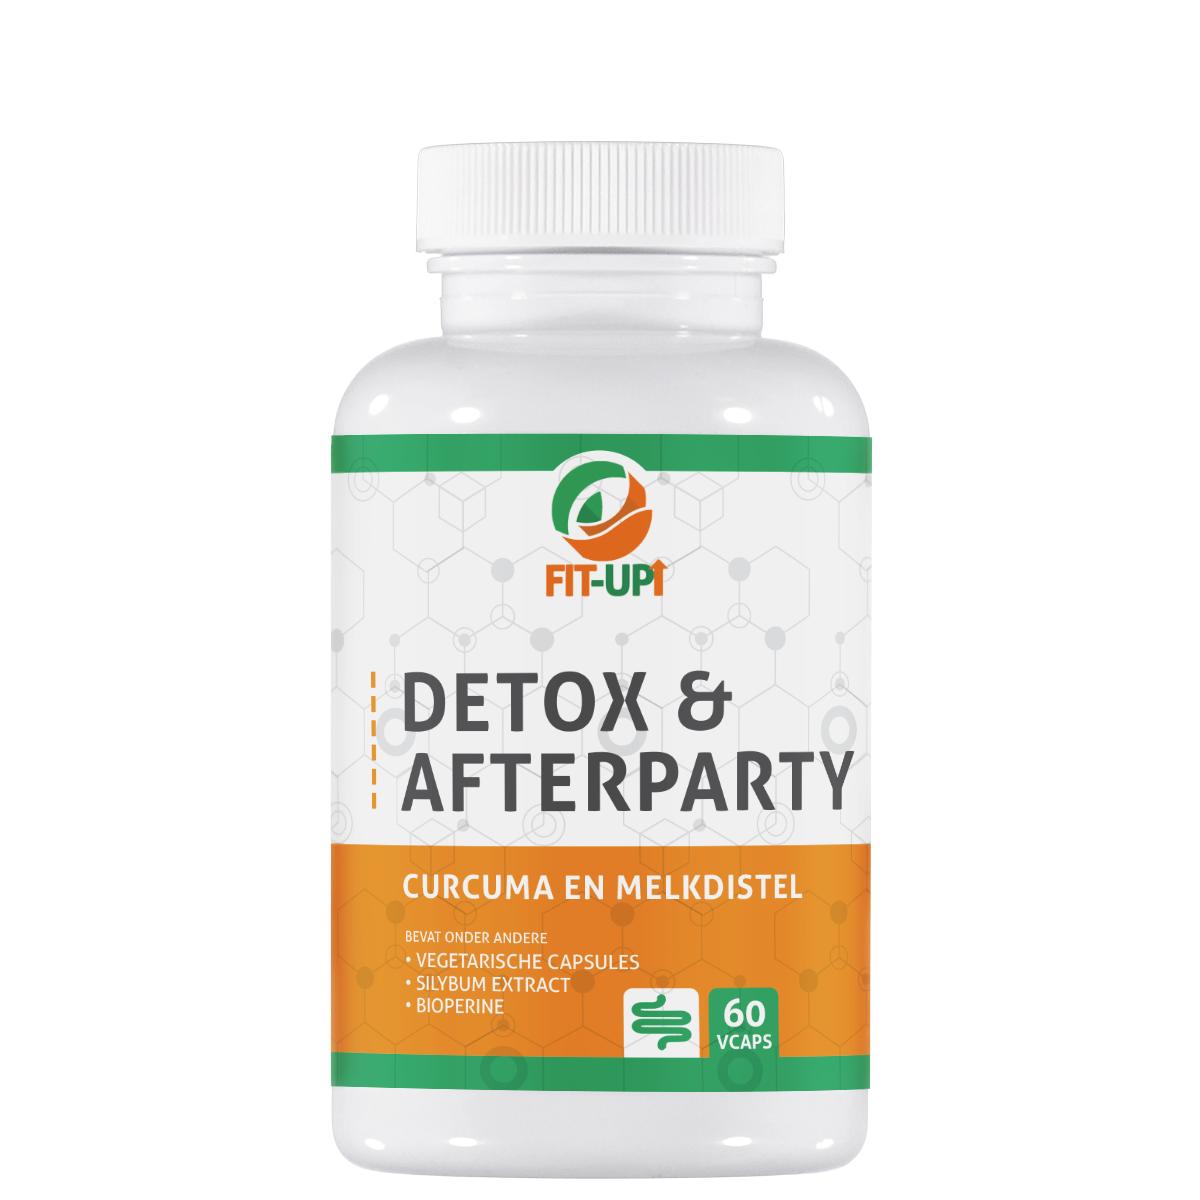 Detox en afterparty - 60 capsules